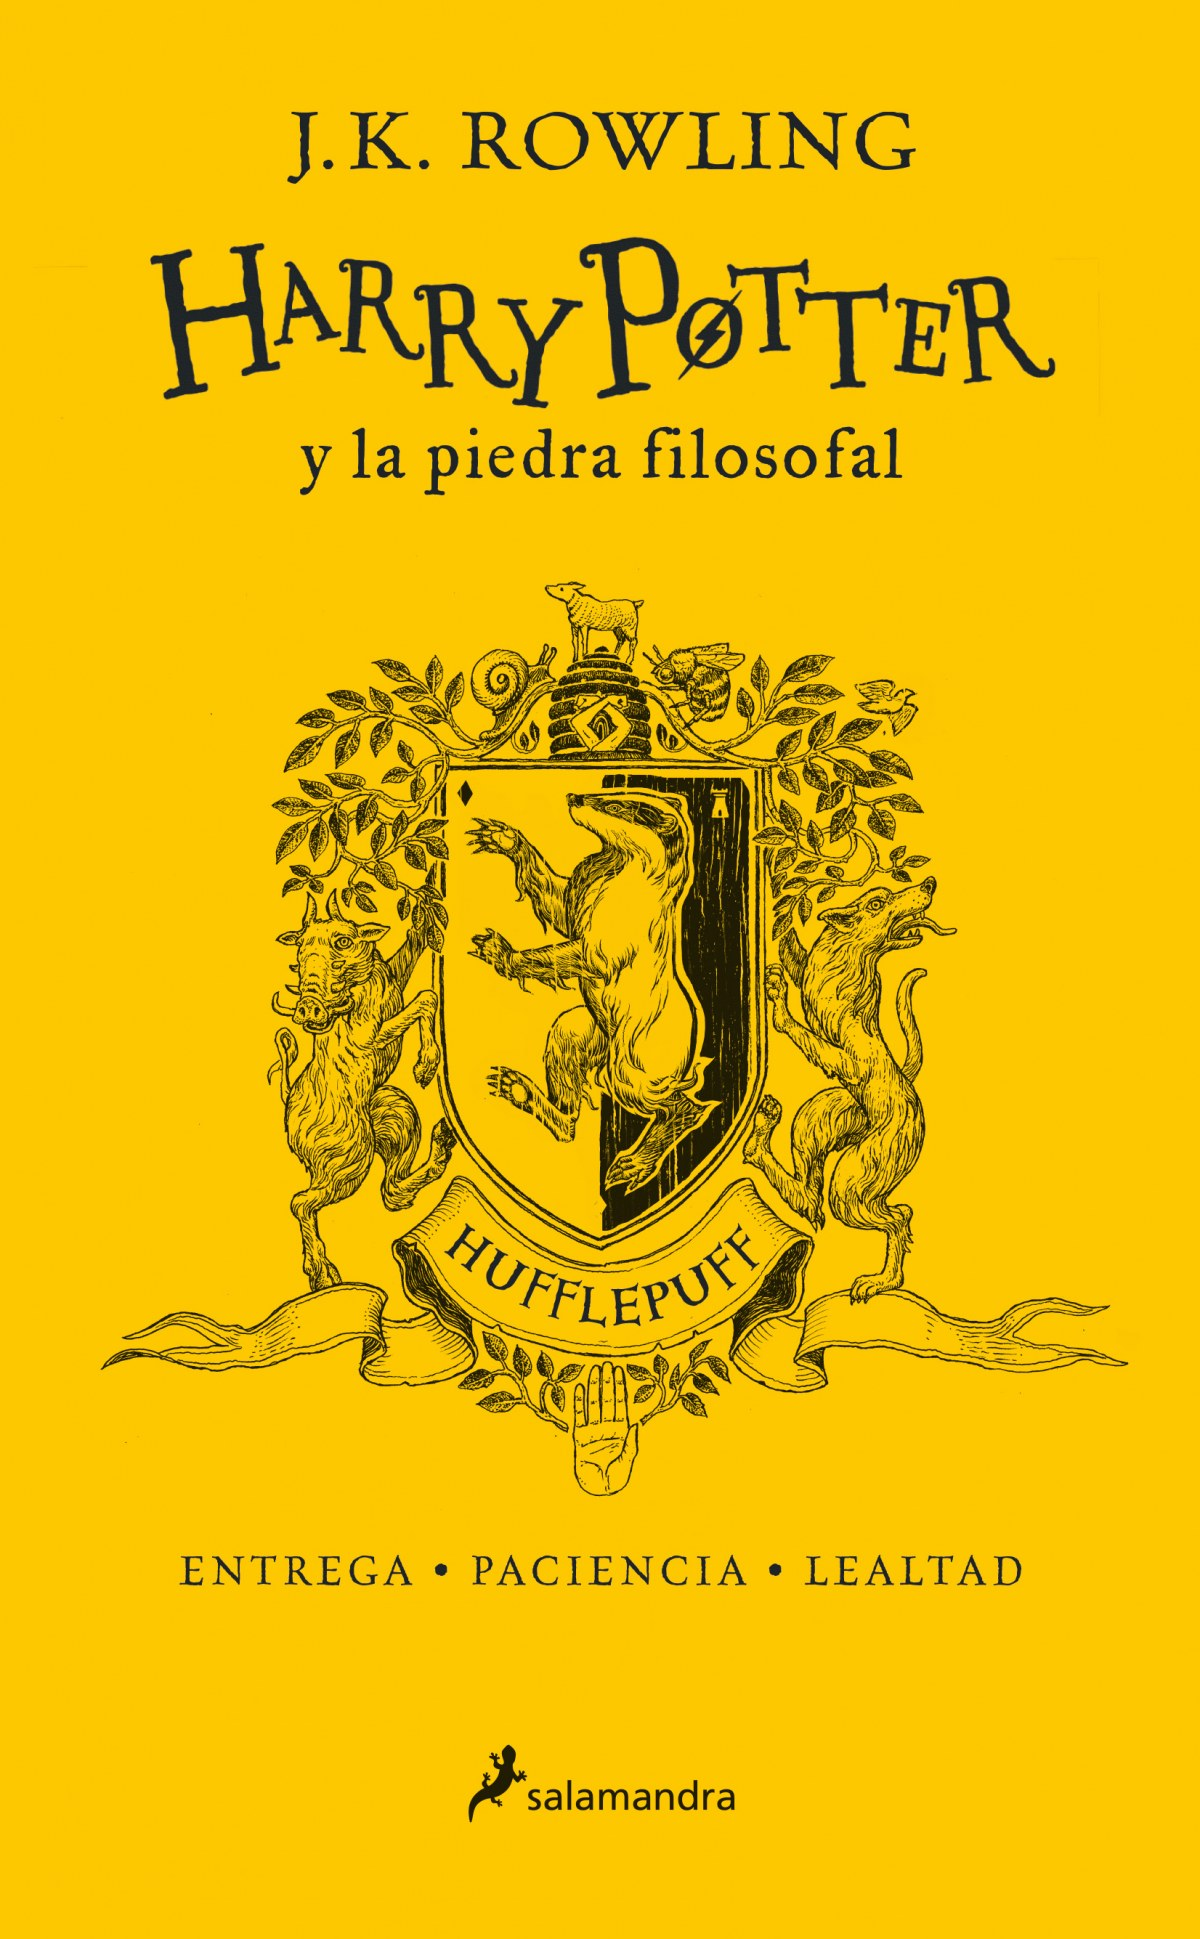 HUFFLEPUFF HARRY POTTER Y LA PIEDRA FILOSOFAL 9788498388893